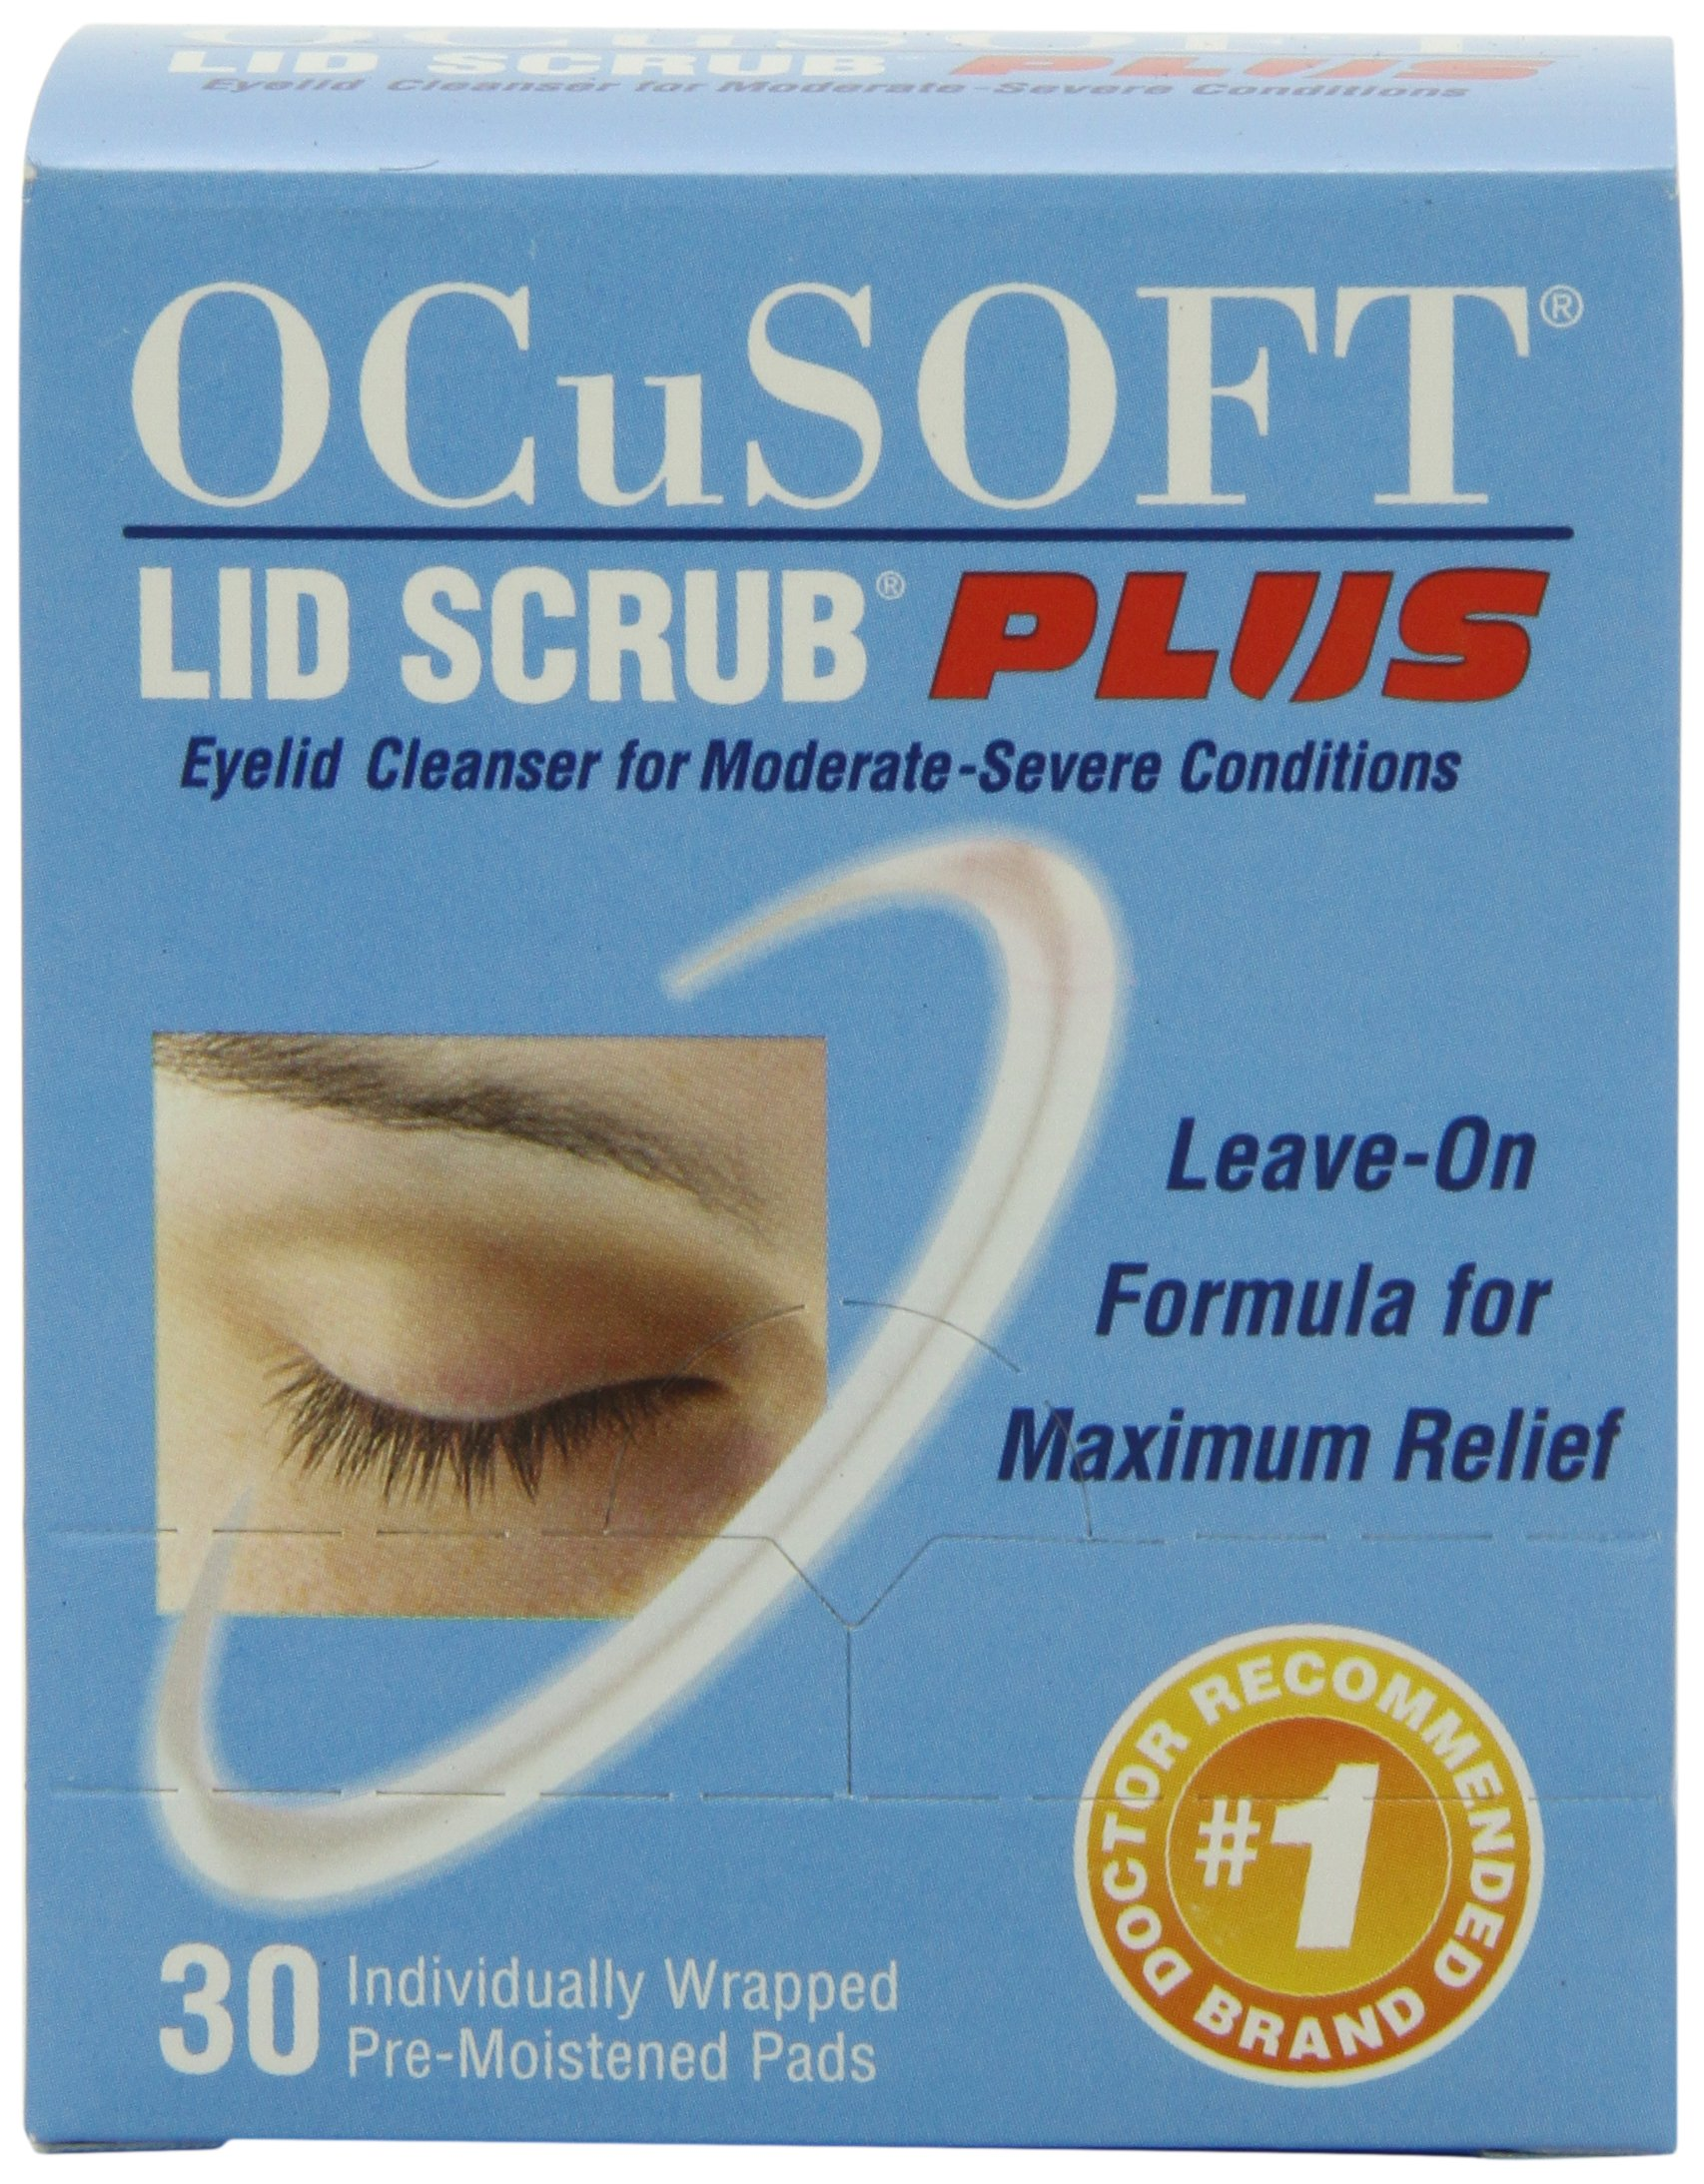 OCuSOFT Lid Scrub Plus, Pre-Moistened Pads, 30 Count by OCuSOFT